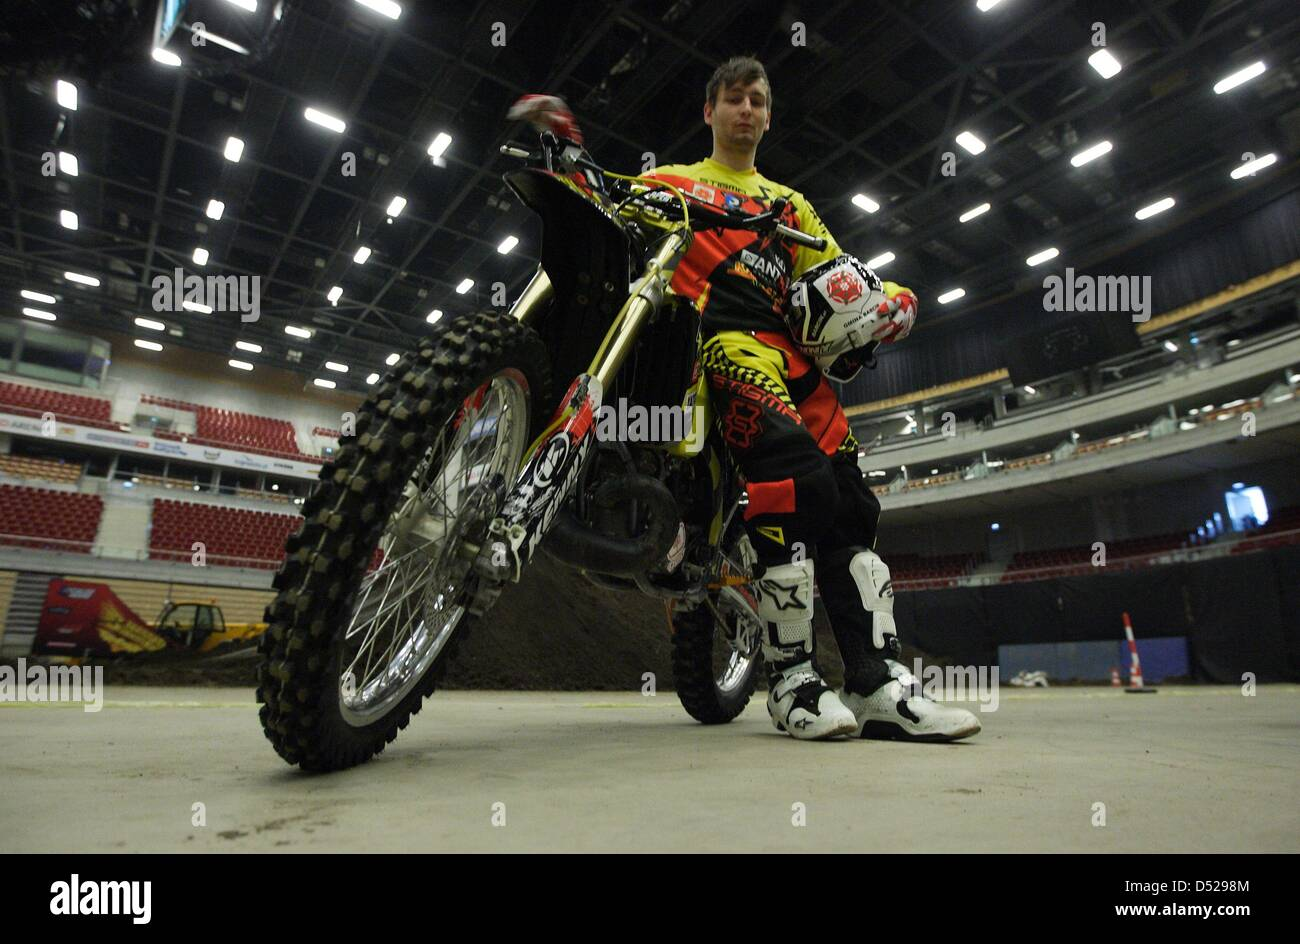 Motocross Fmx Free Style Motocross Ergo Arena Stock Photos